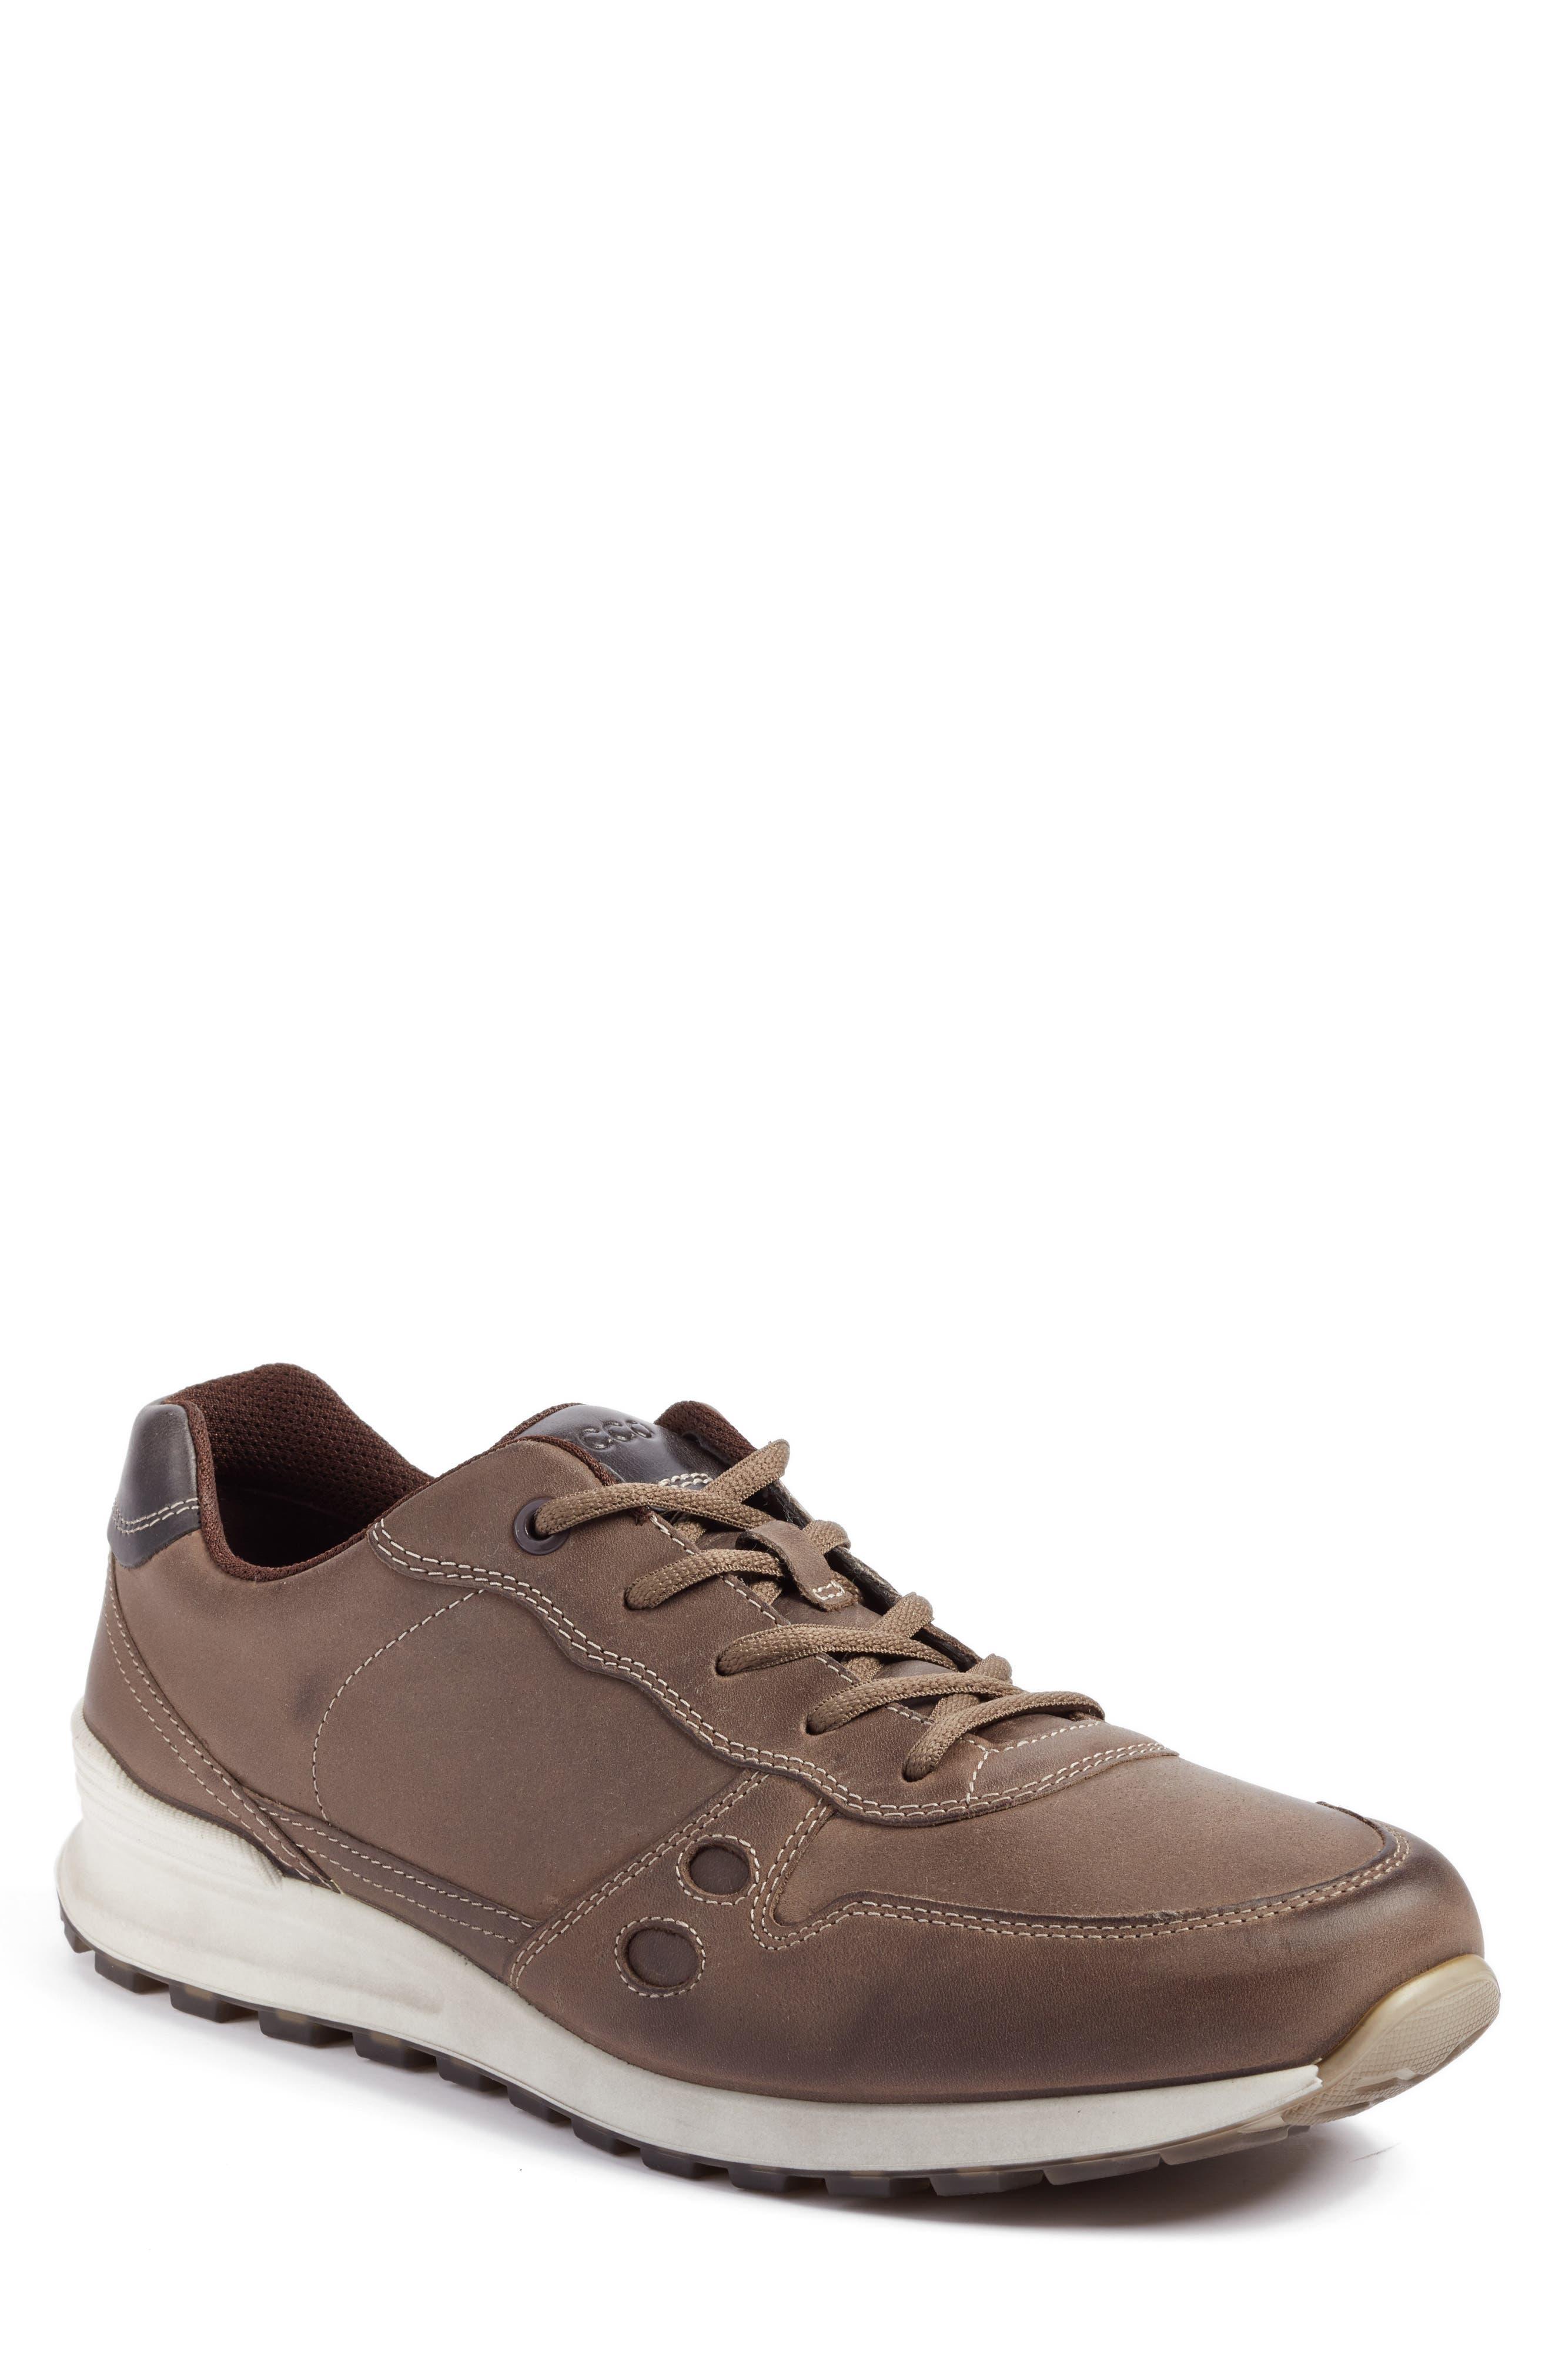 ECCO CS14 Retro Sneaker (Men)